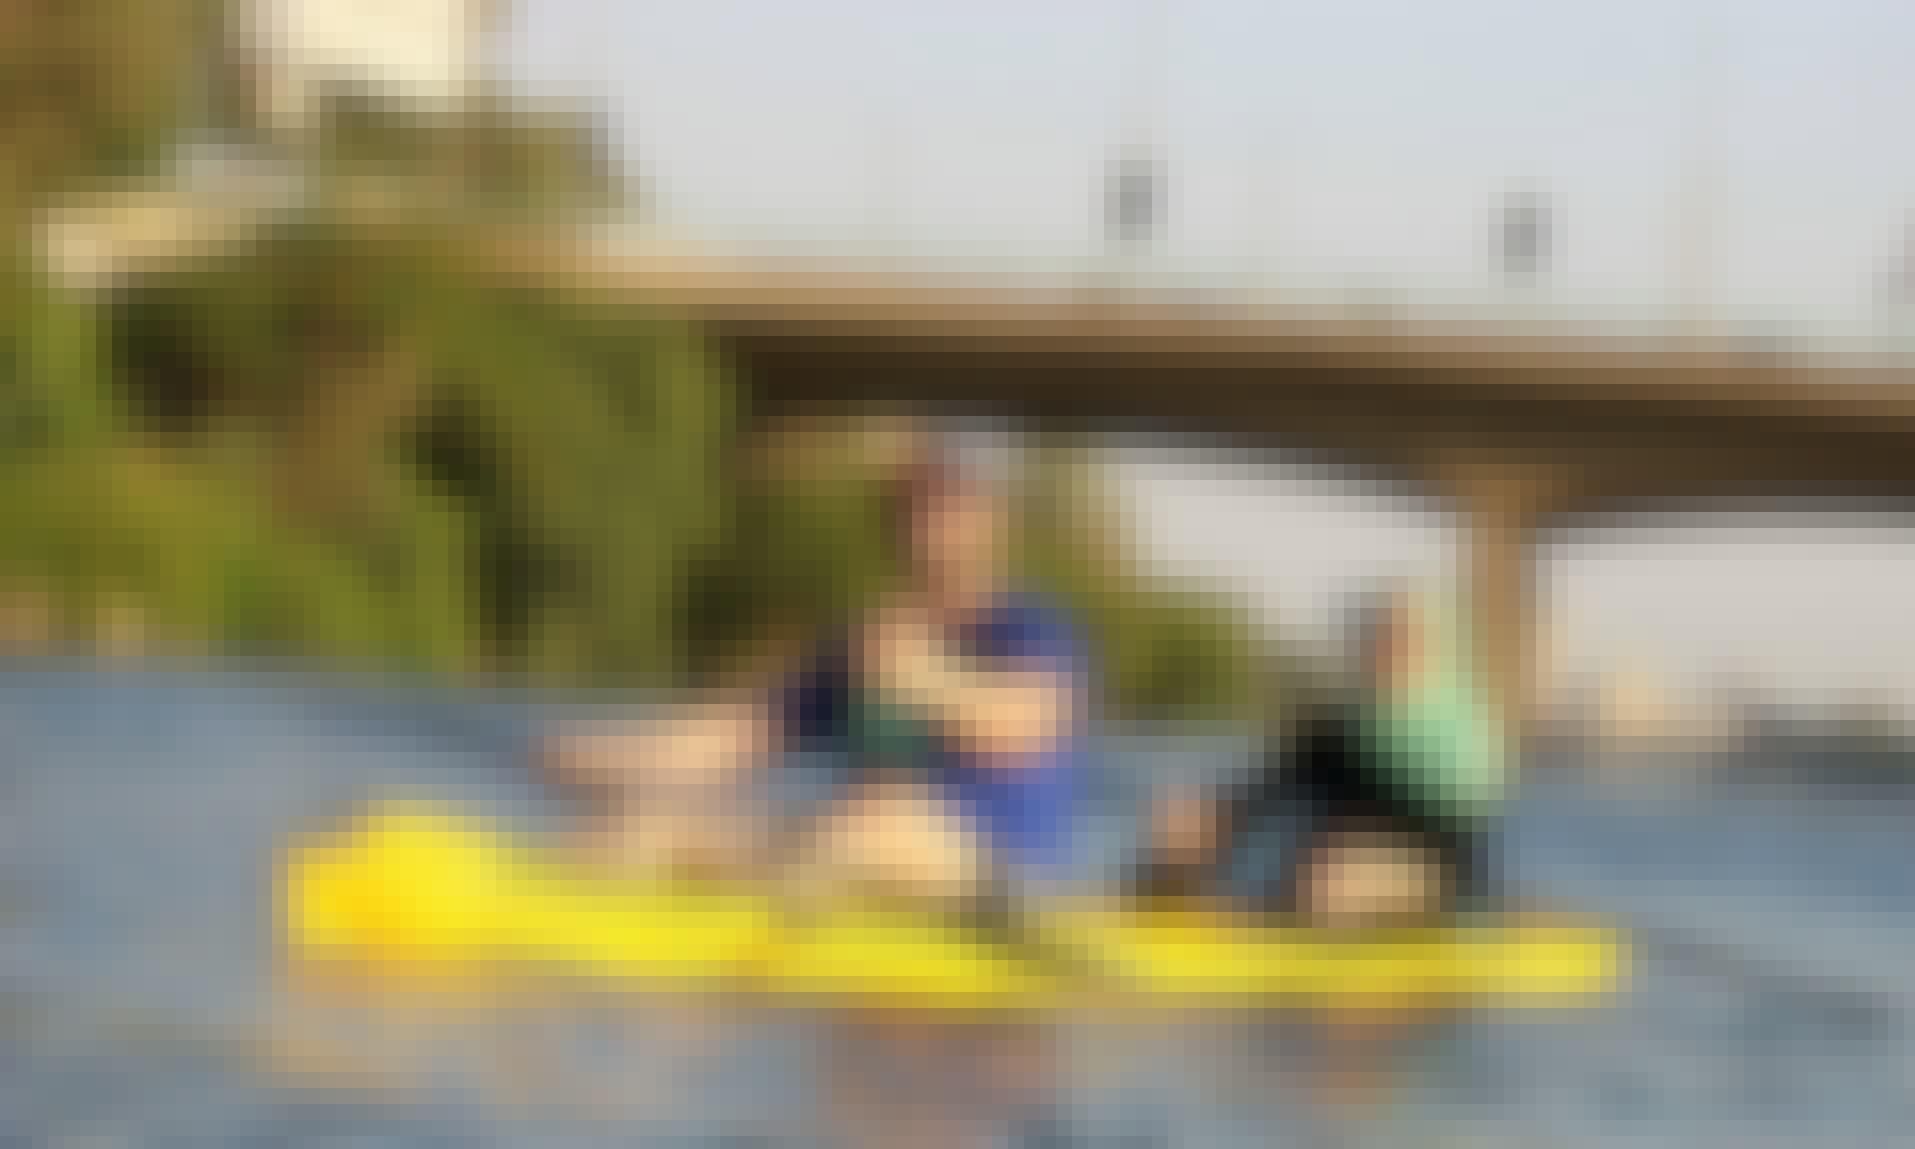 Kayaking: Adventurous way to explore Qasr Ad Dobarah, Egypt